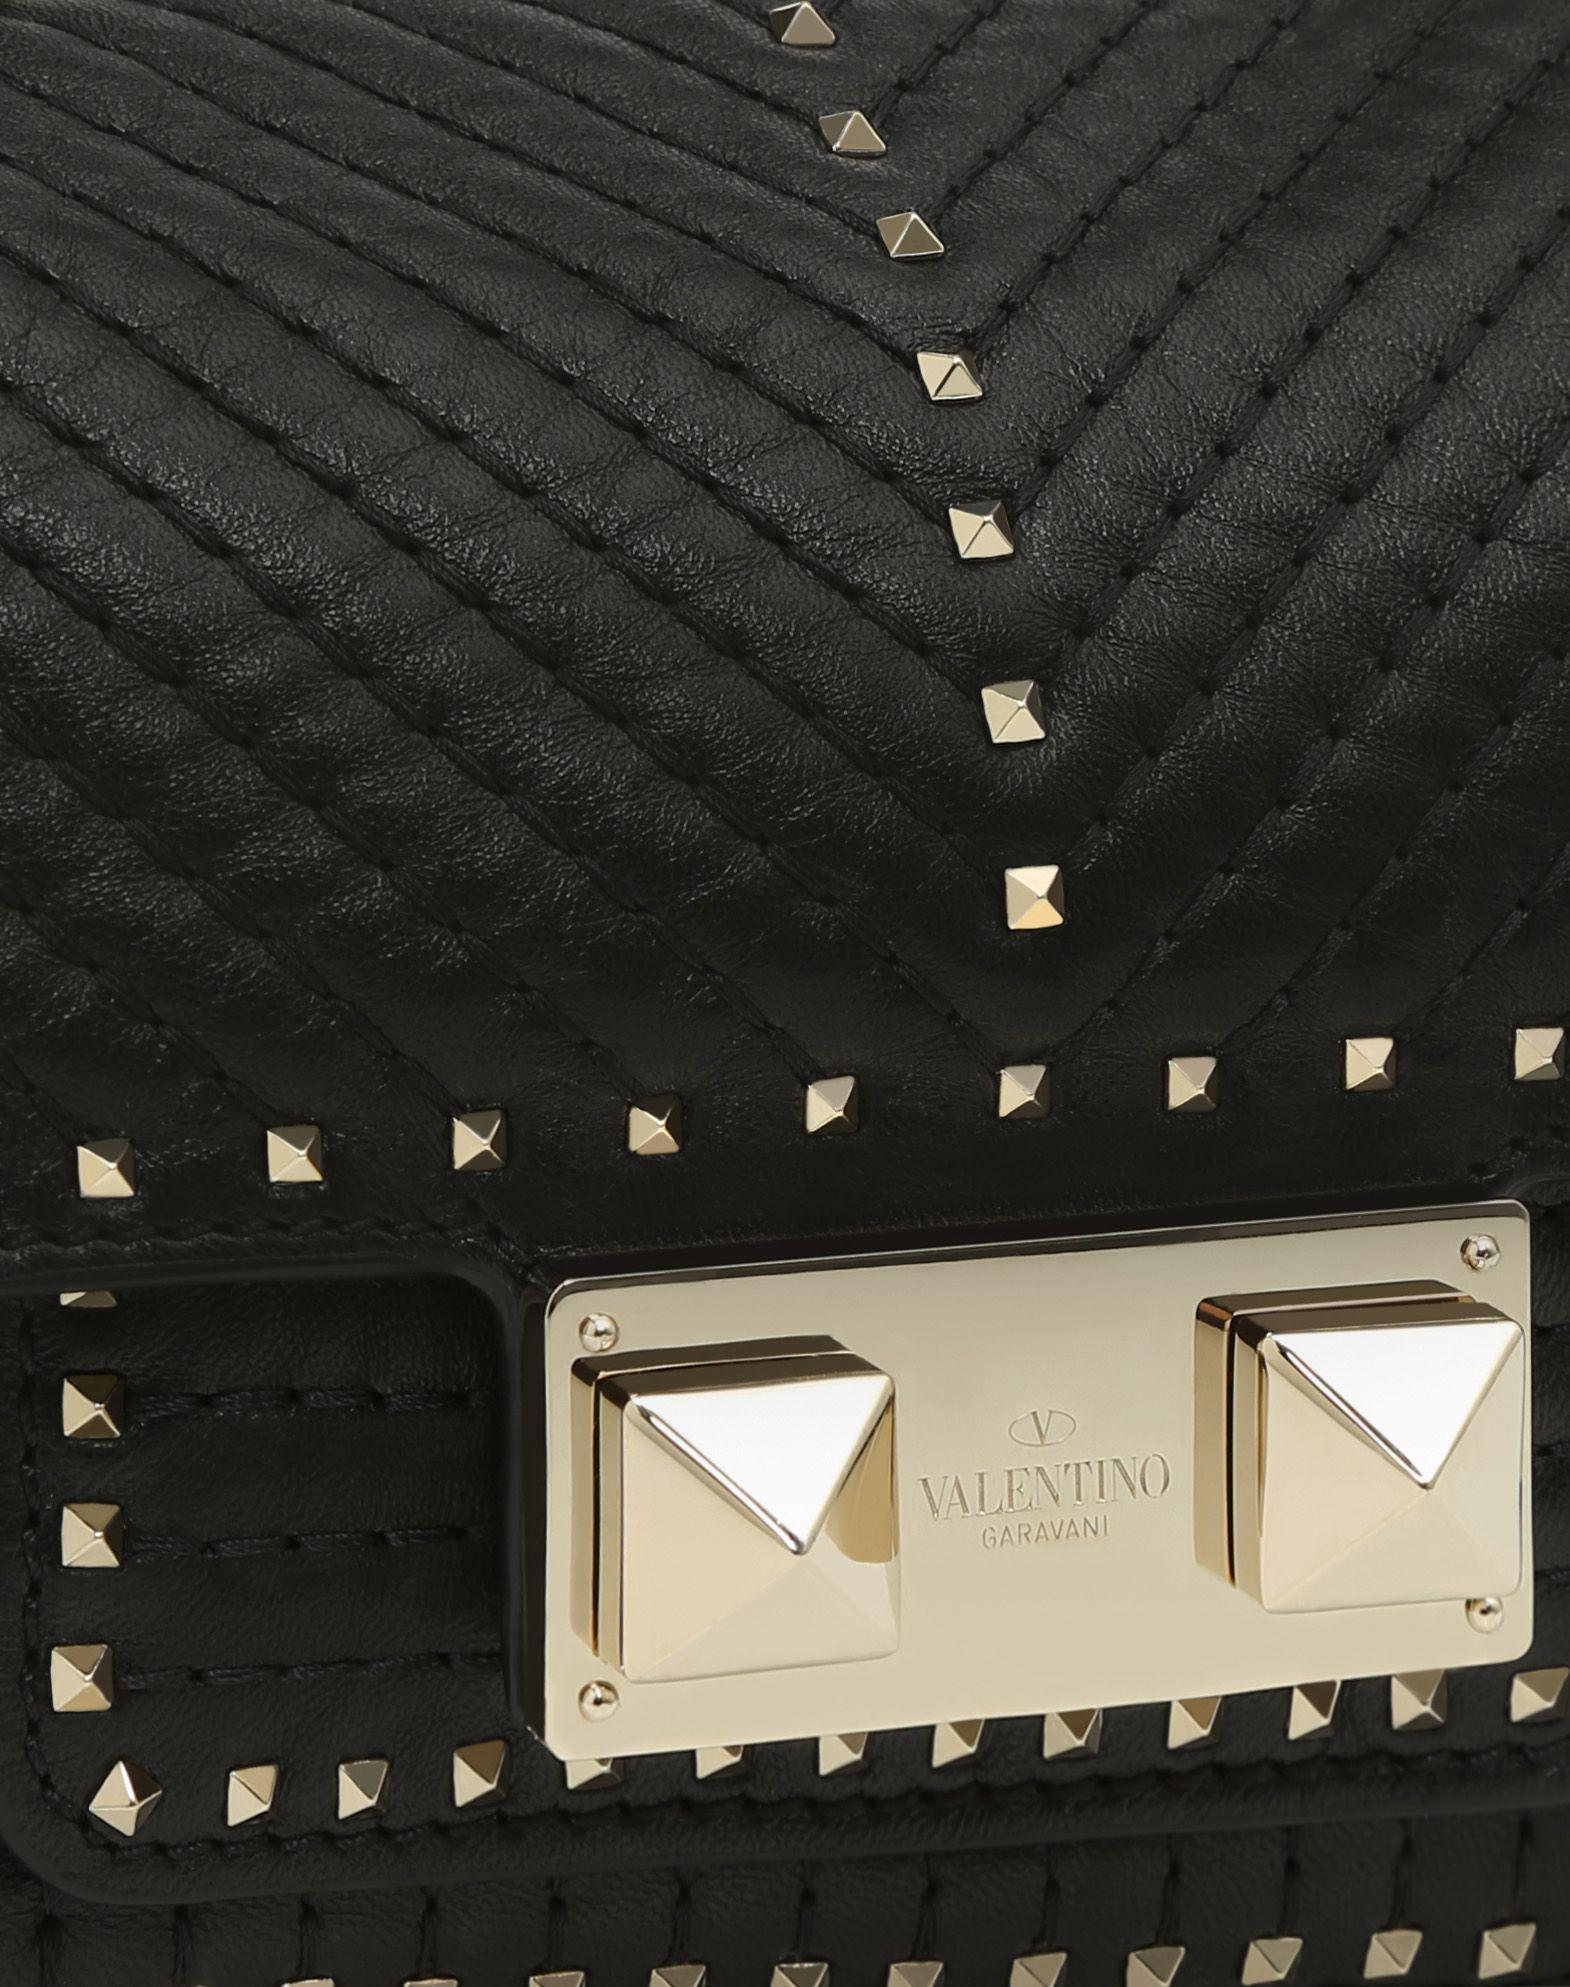 VALENTINO GARAVANI Mini Body Bag BUM BAG D b